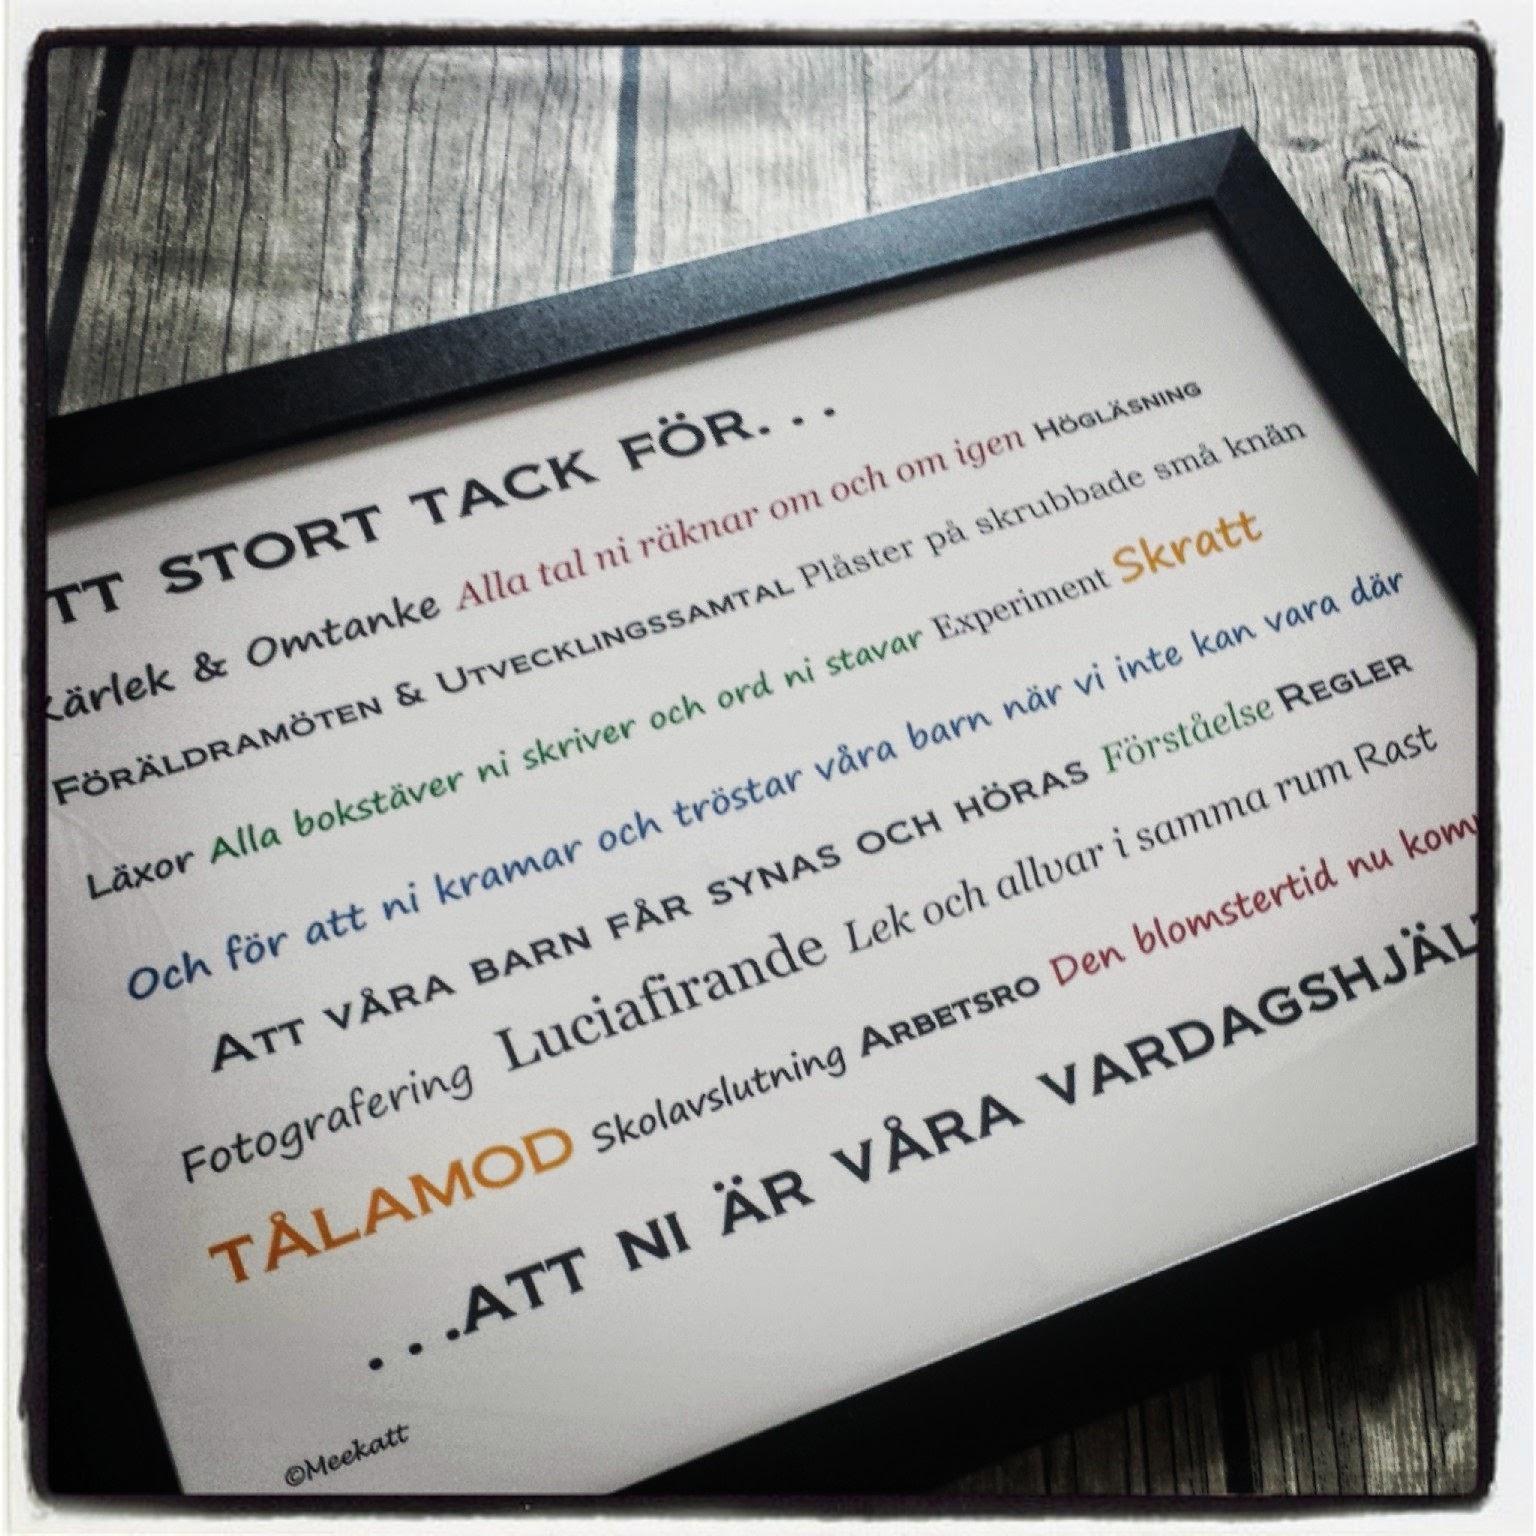 http://www.yourvismawebsite.com/birgersson-malin/shop/product/tack-till-larare?tm=webshop